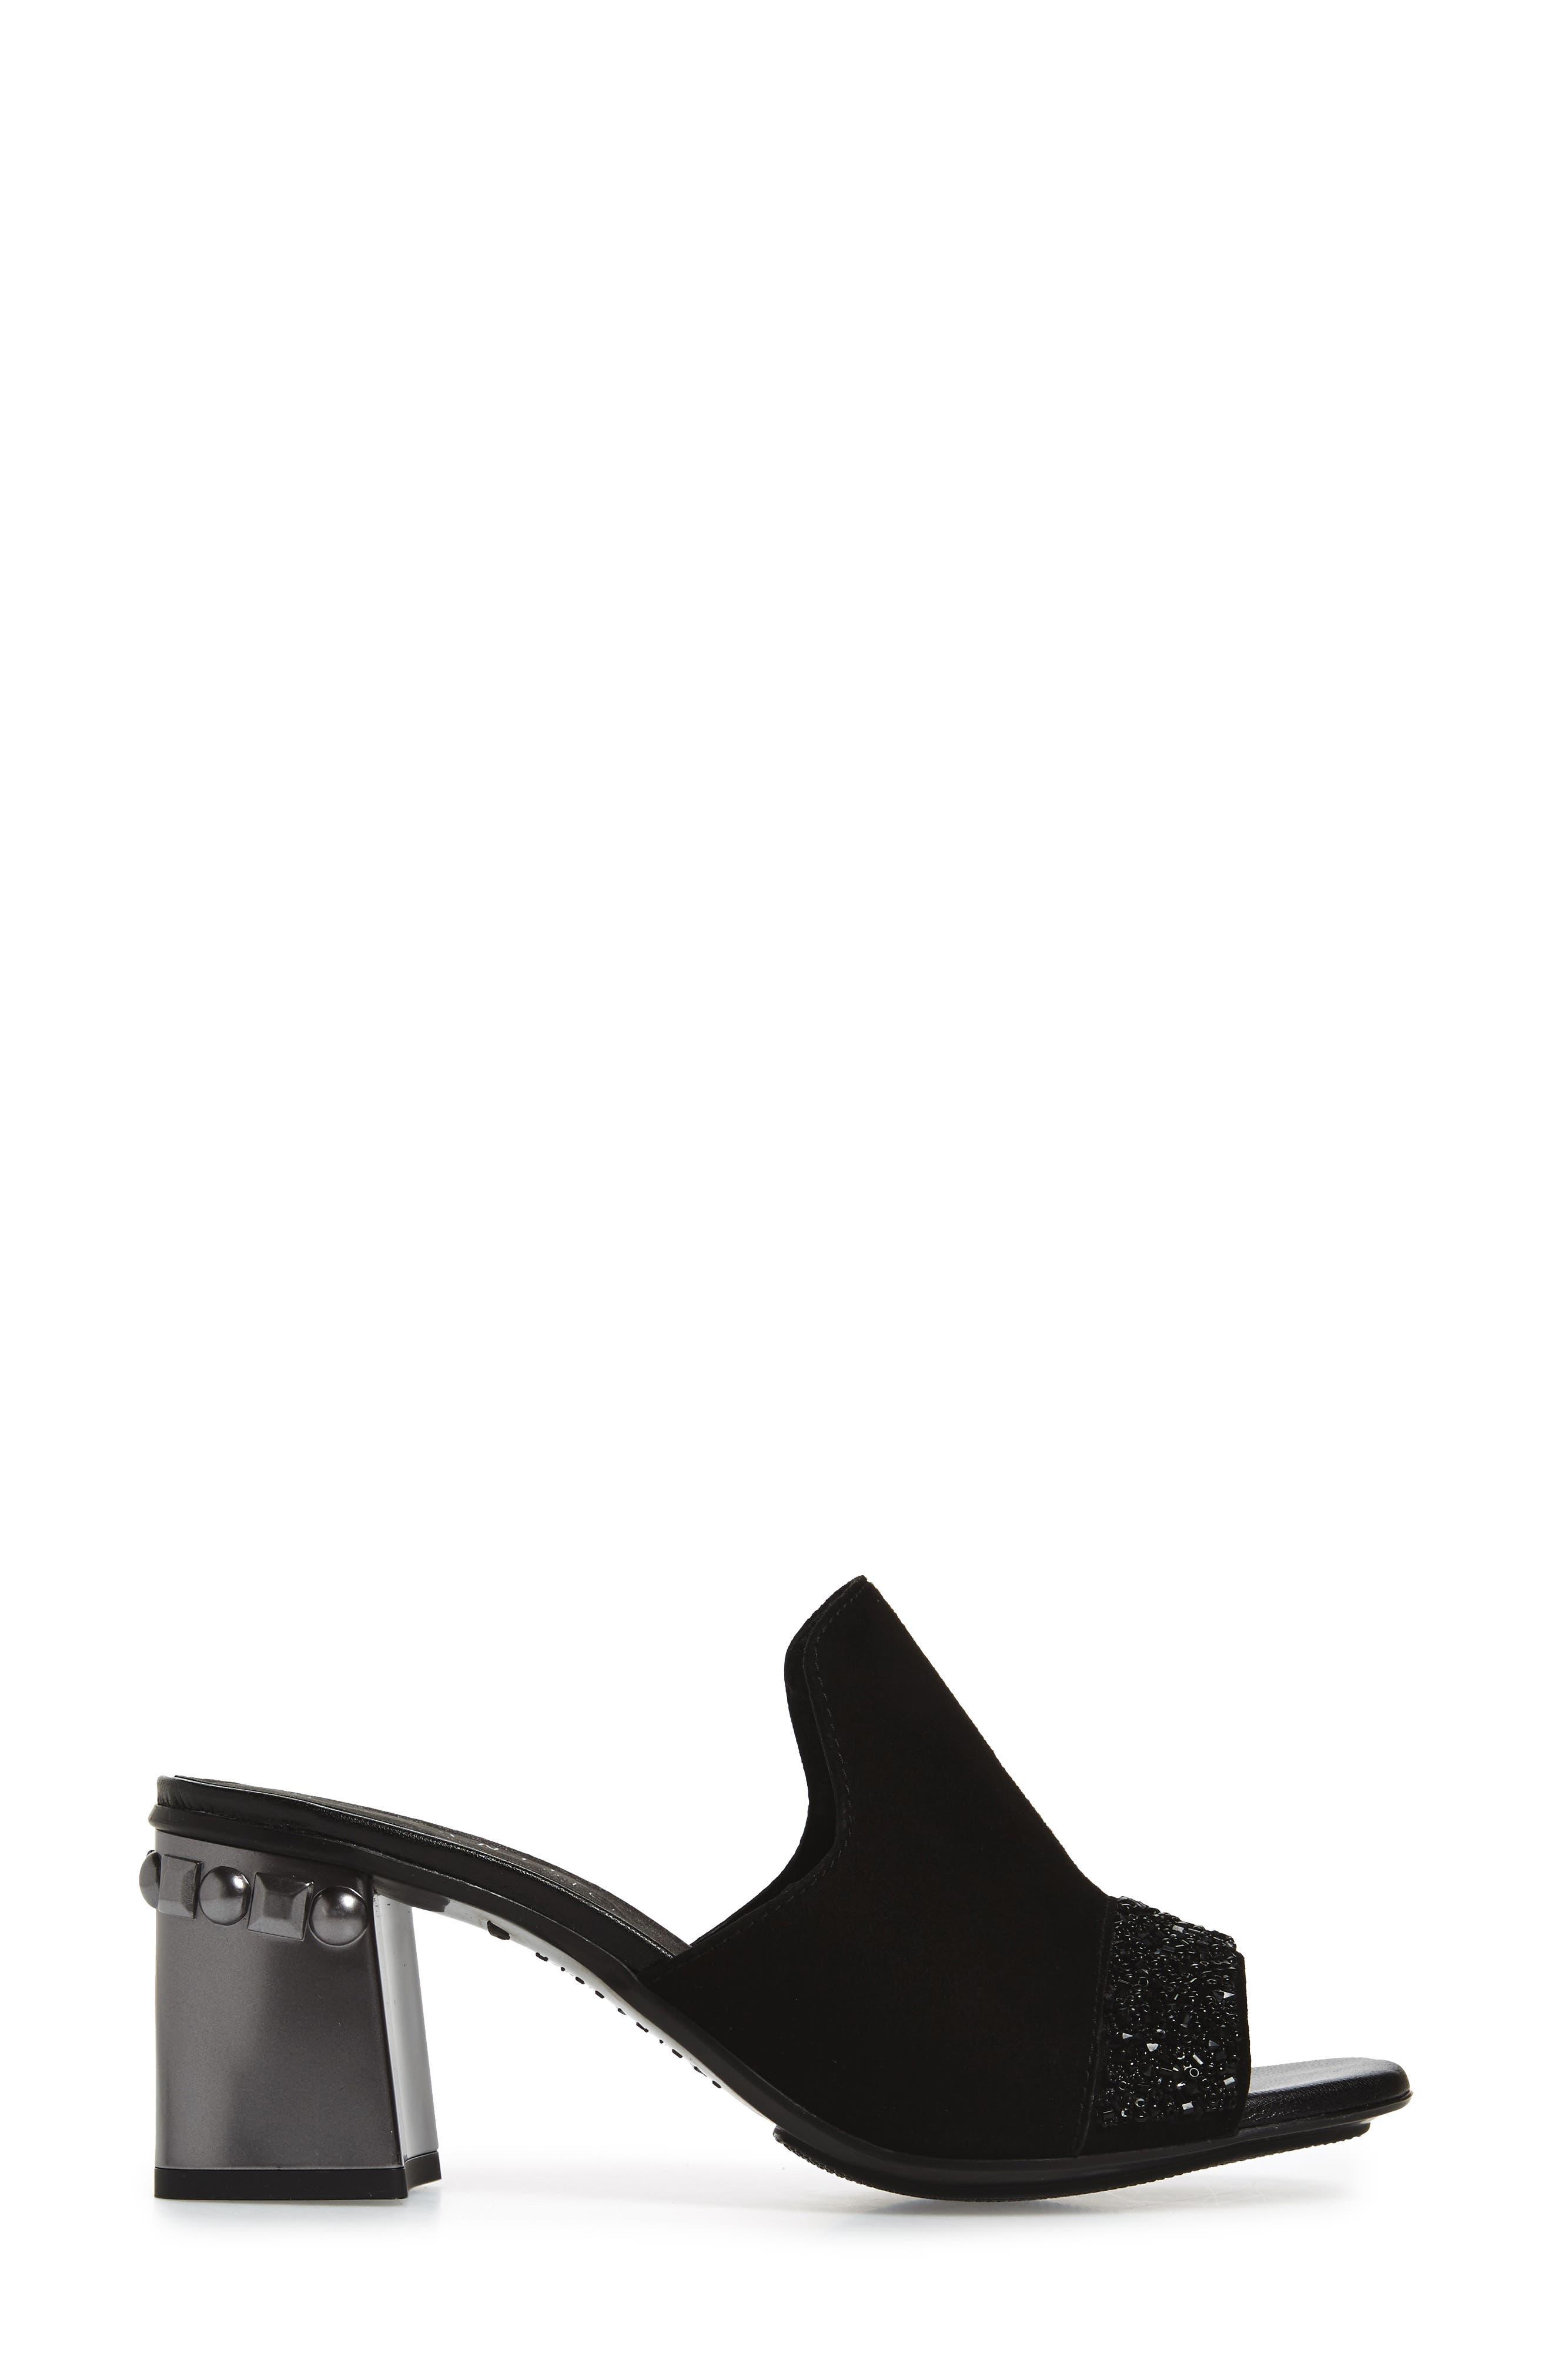 Stormie Slide Sandal,                             Alternate thumbnail 3, color,                             001